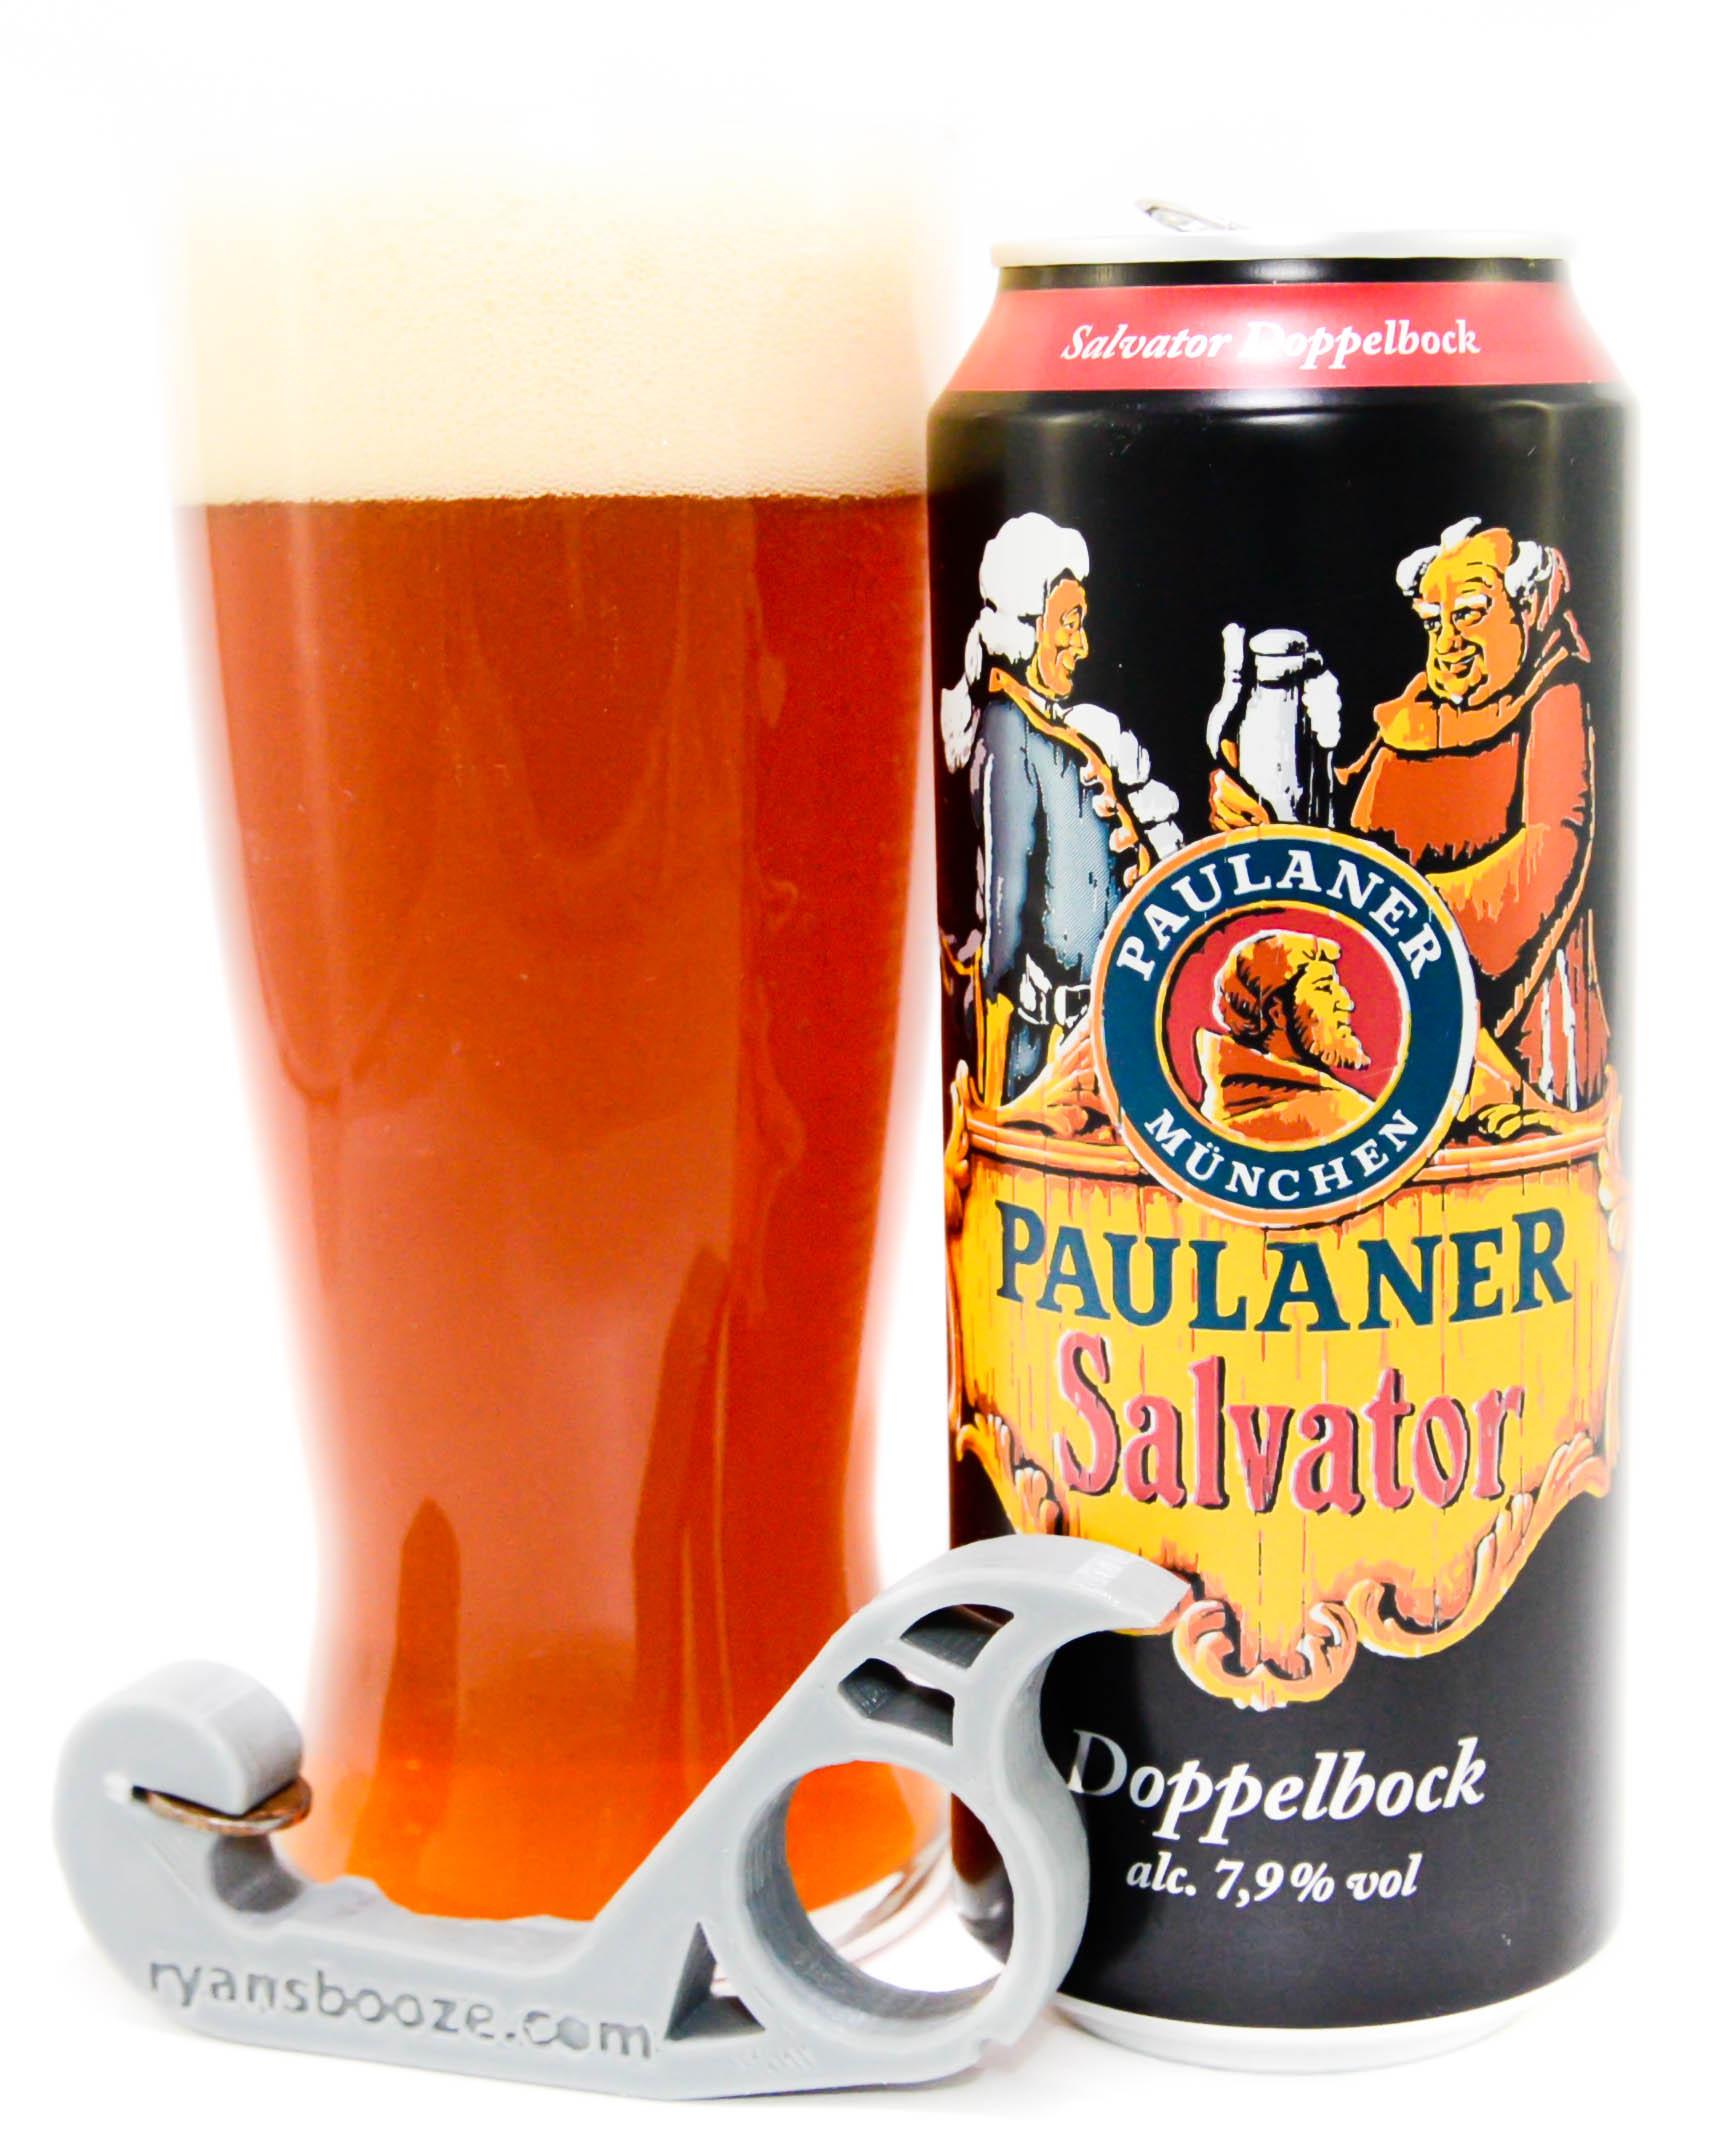 cerveza paulaner salvator doppelbock 330cc - alemania